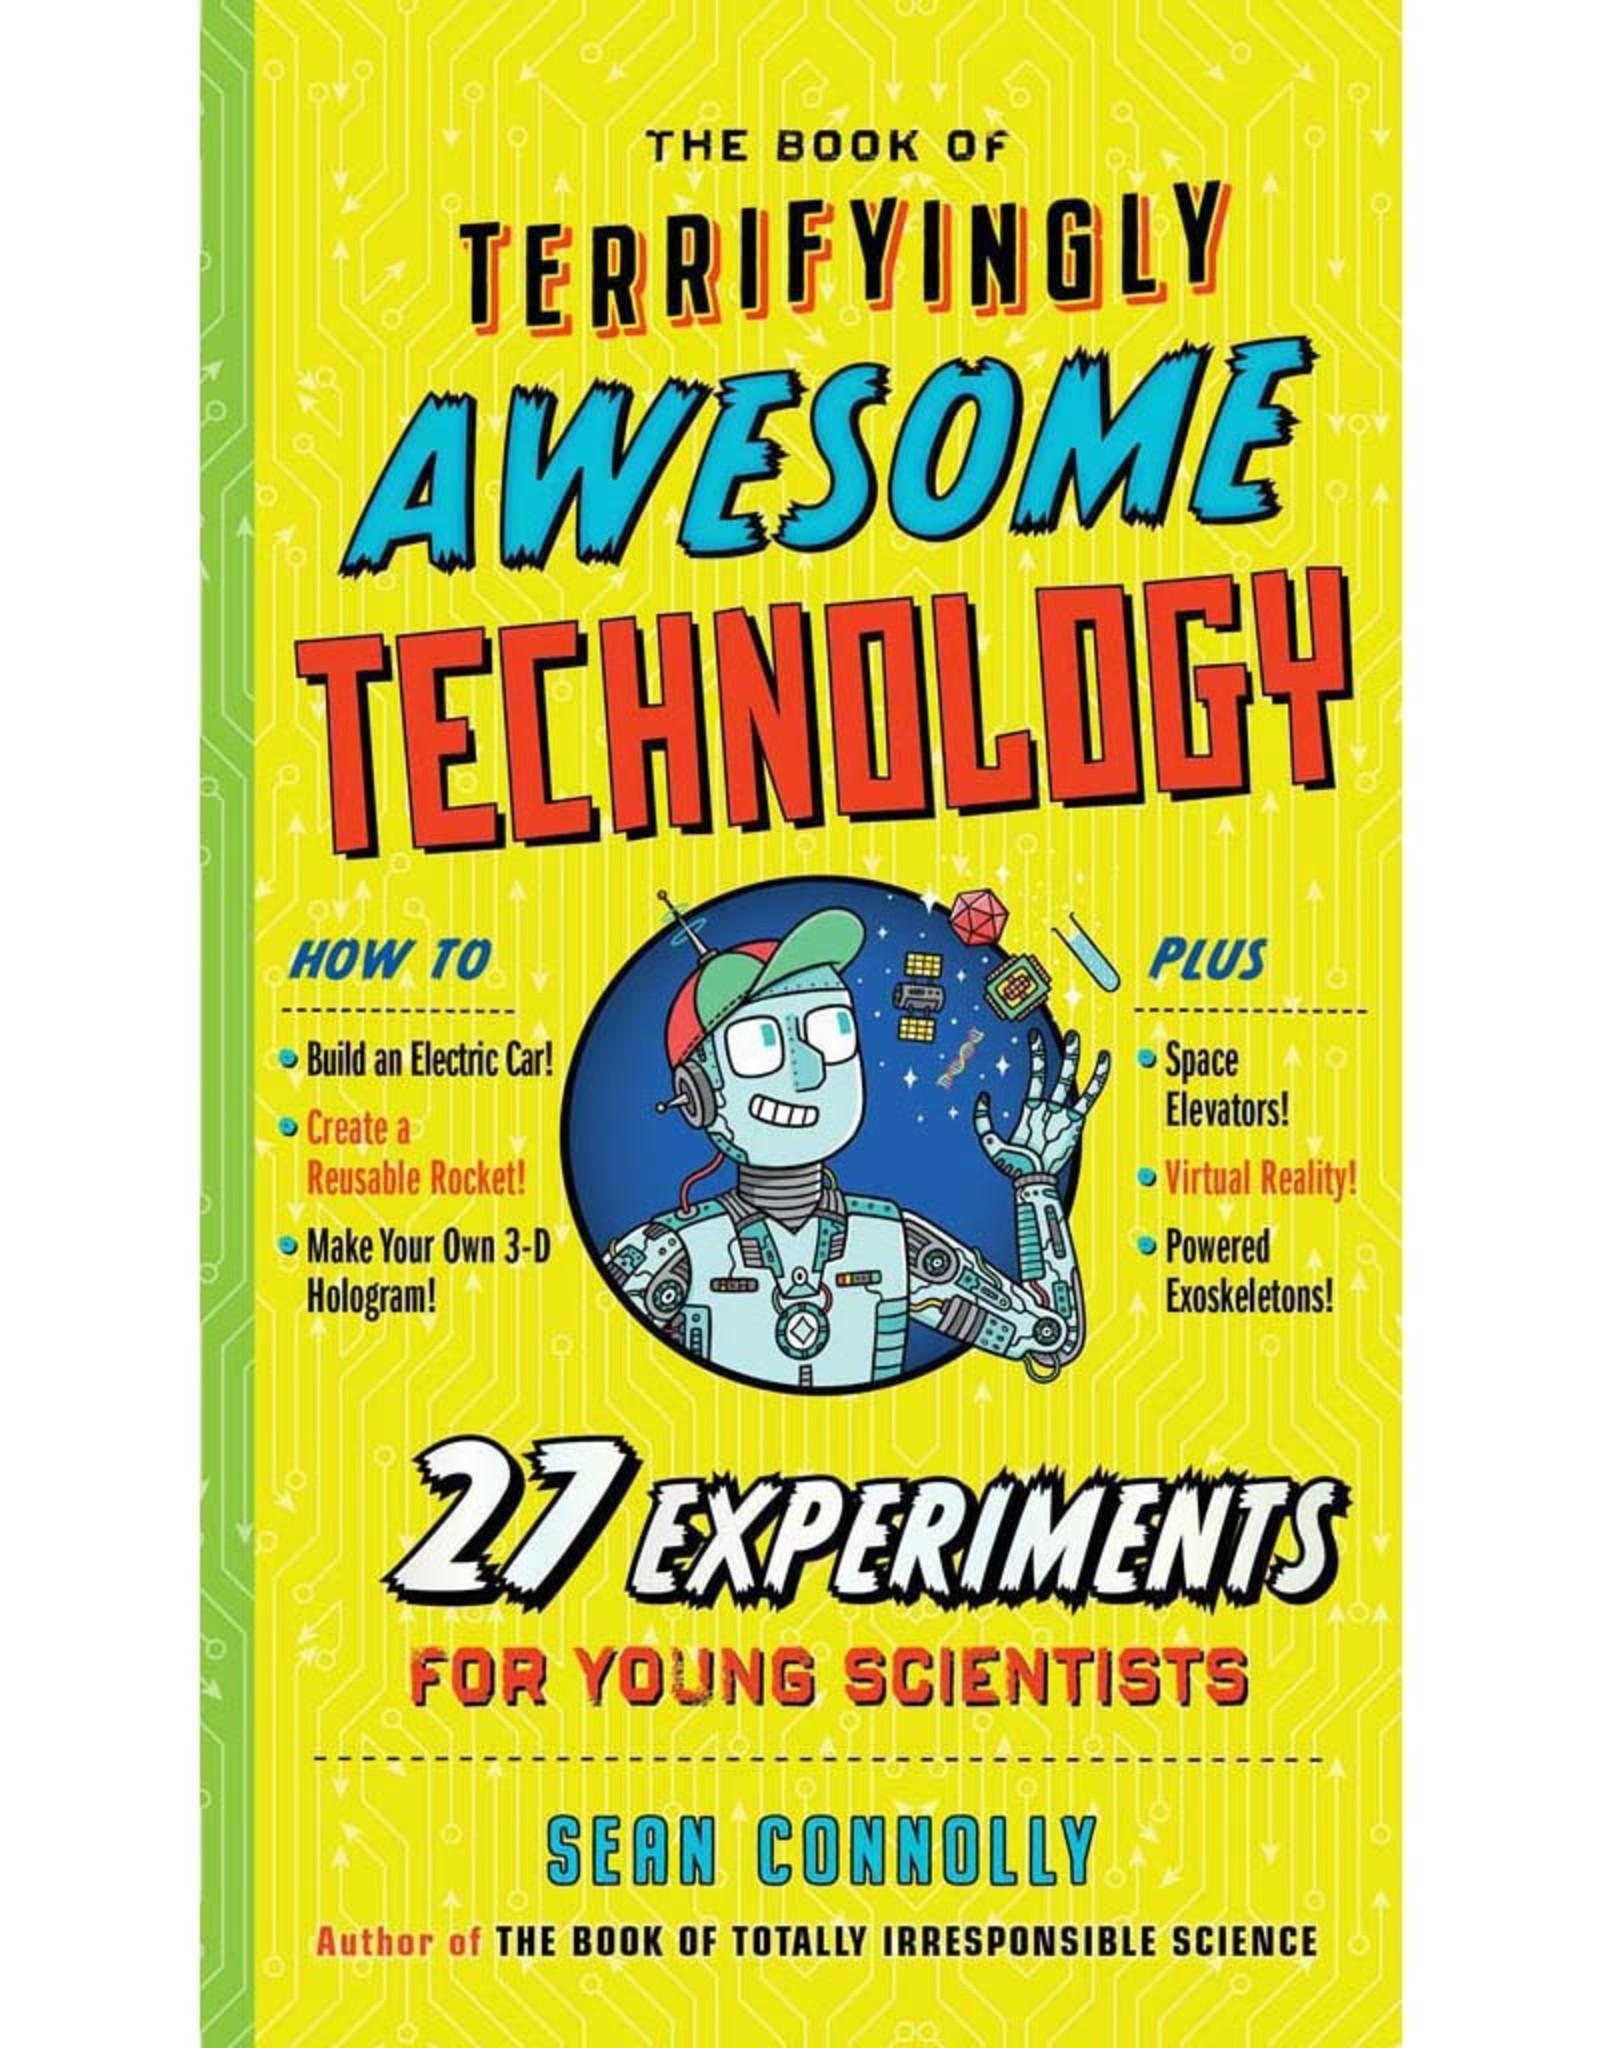 Terrifyingly Awsome Technology